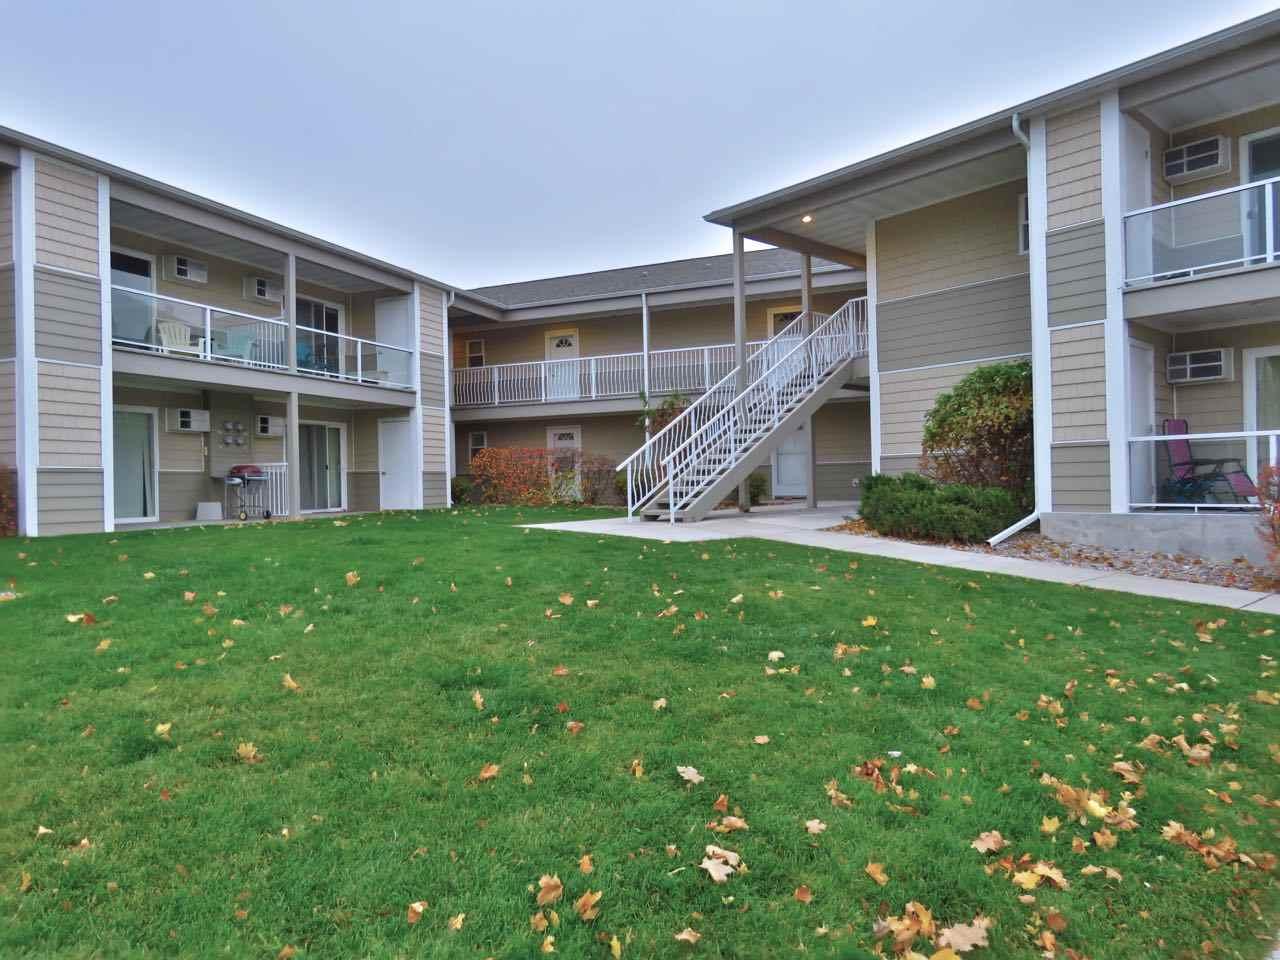 Real Estate for Sale, ListingId: 36234653, Polson,MT59860